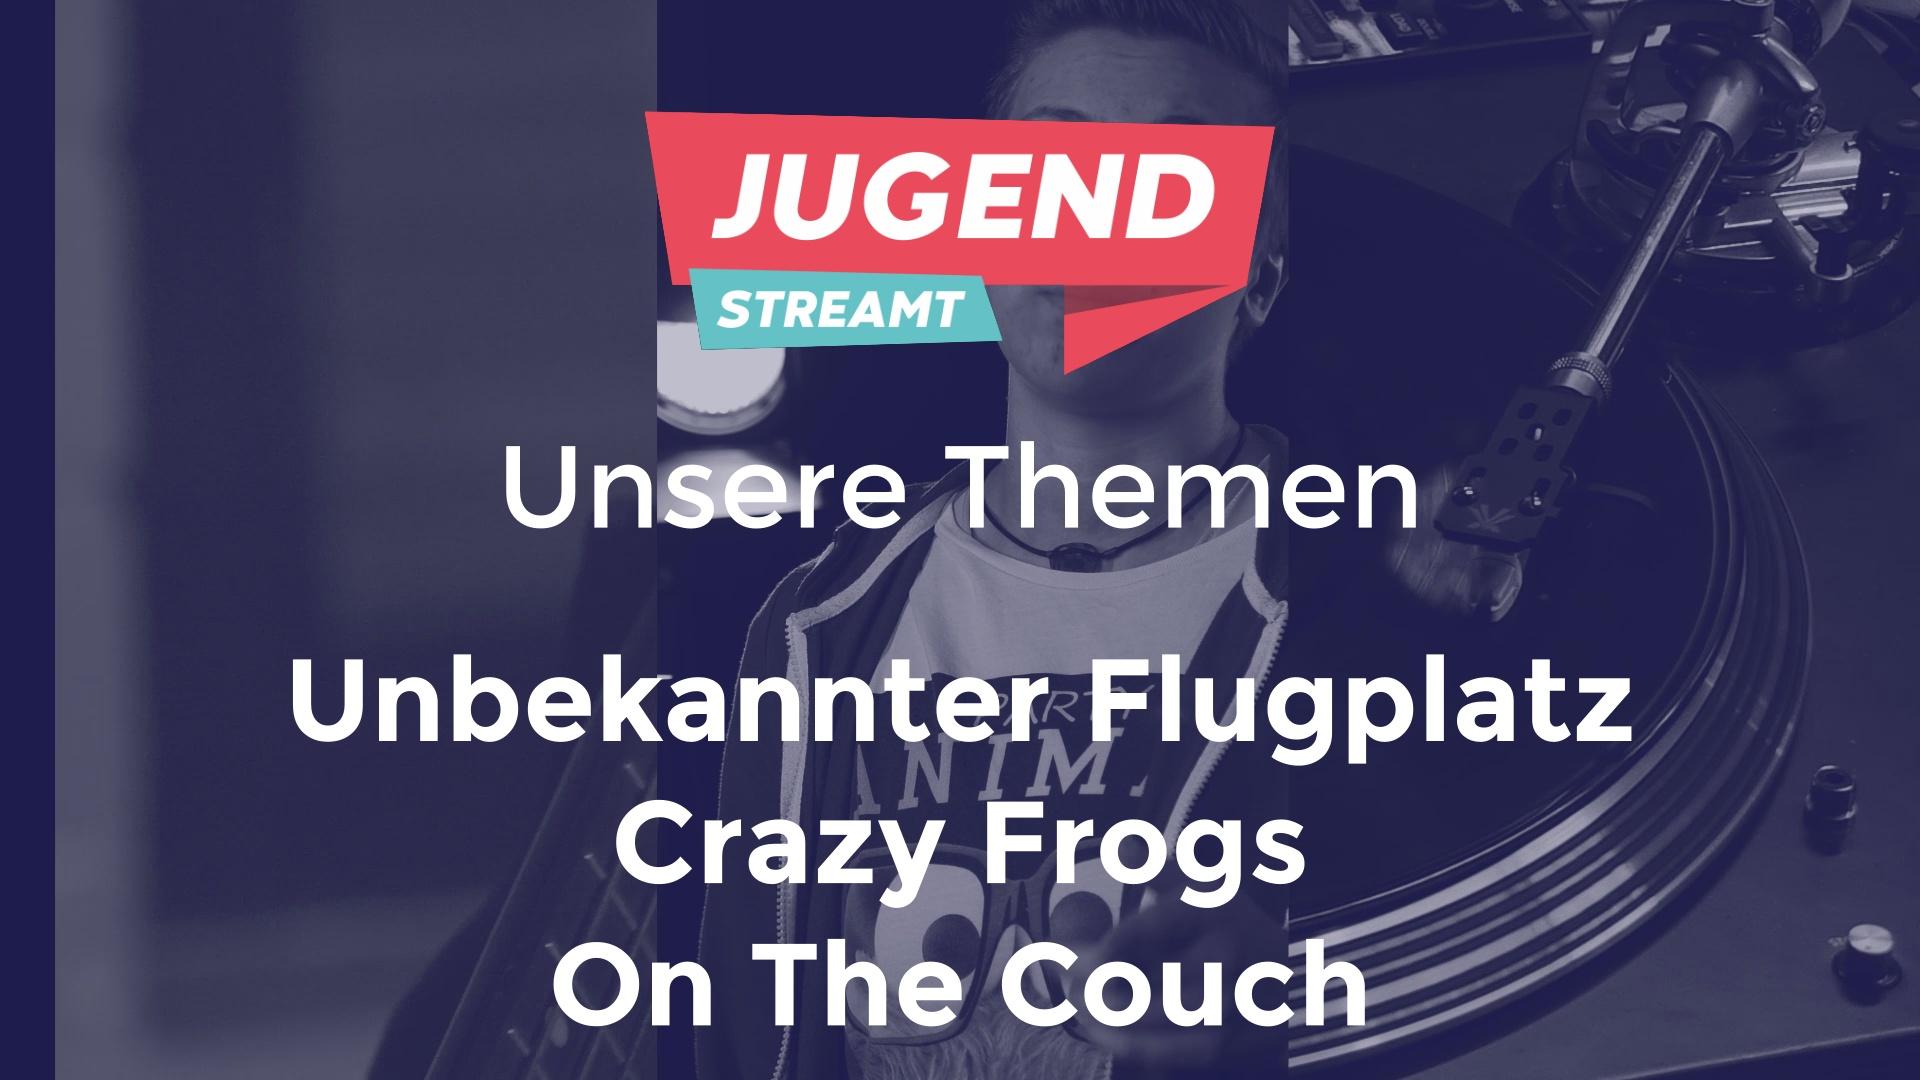 jugendkulturjahr-2020-ratingen-JKJ2020-Jugendstreamt18062020